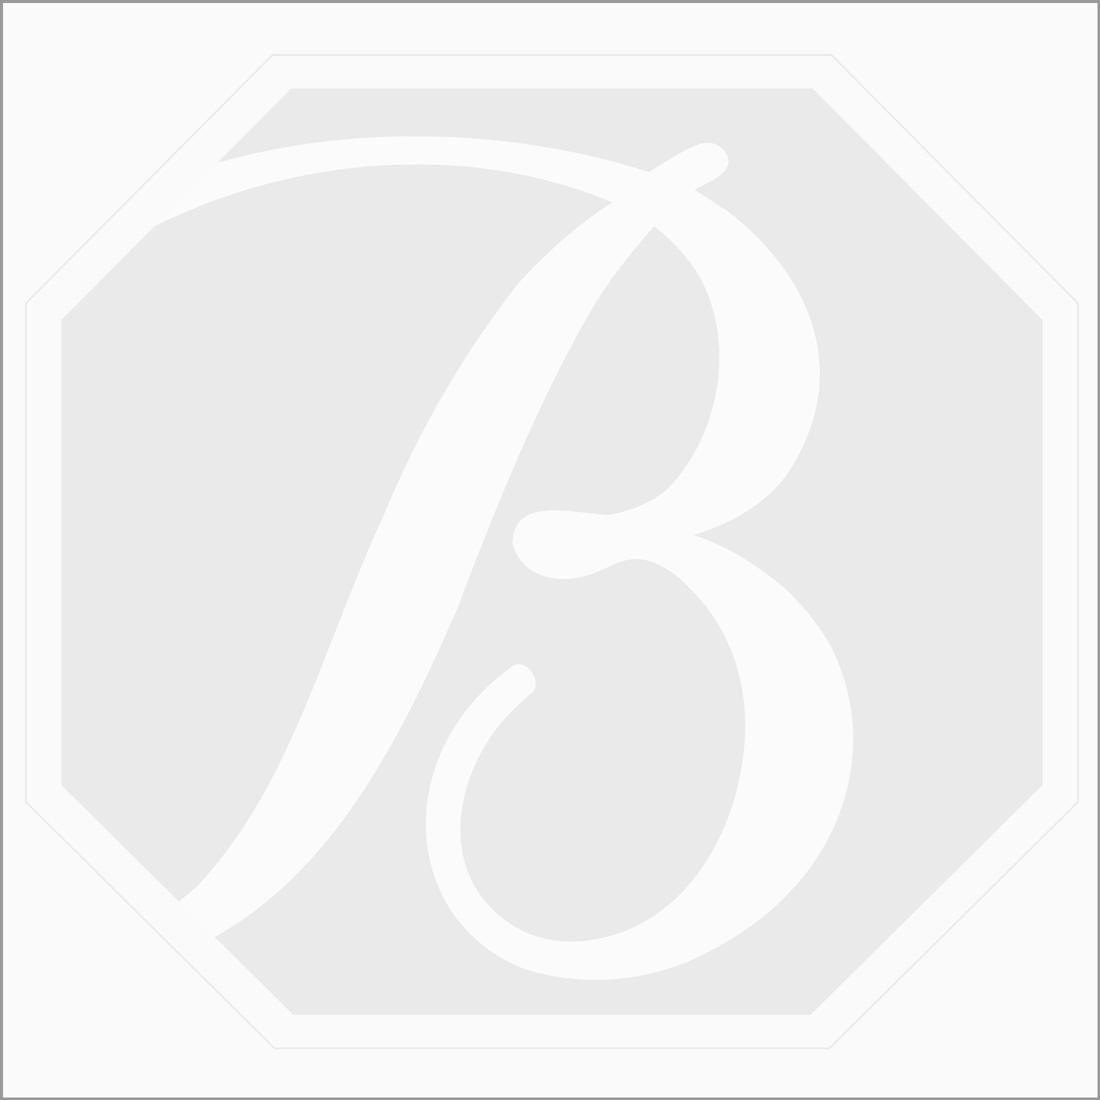 Black Pear Cubic Zirconia Pendant in 925 Sterling Silver